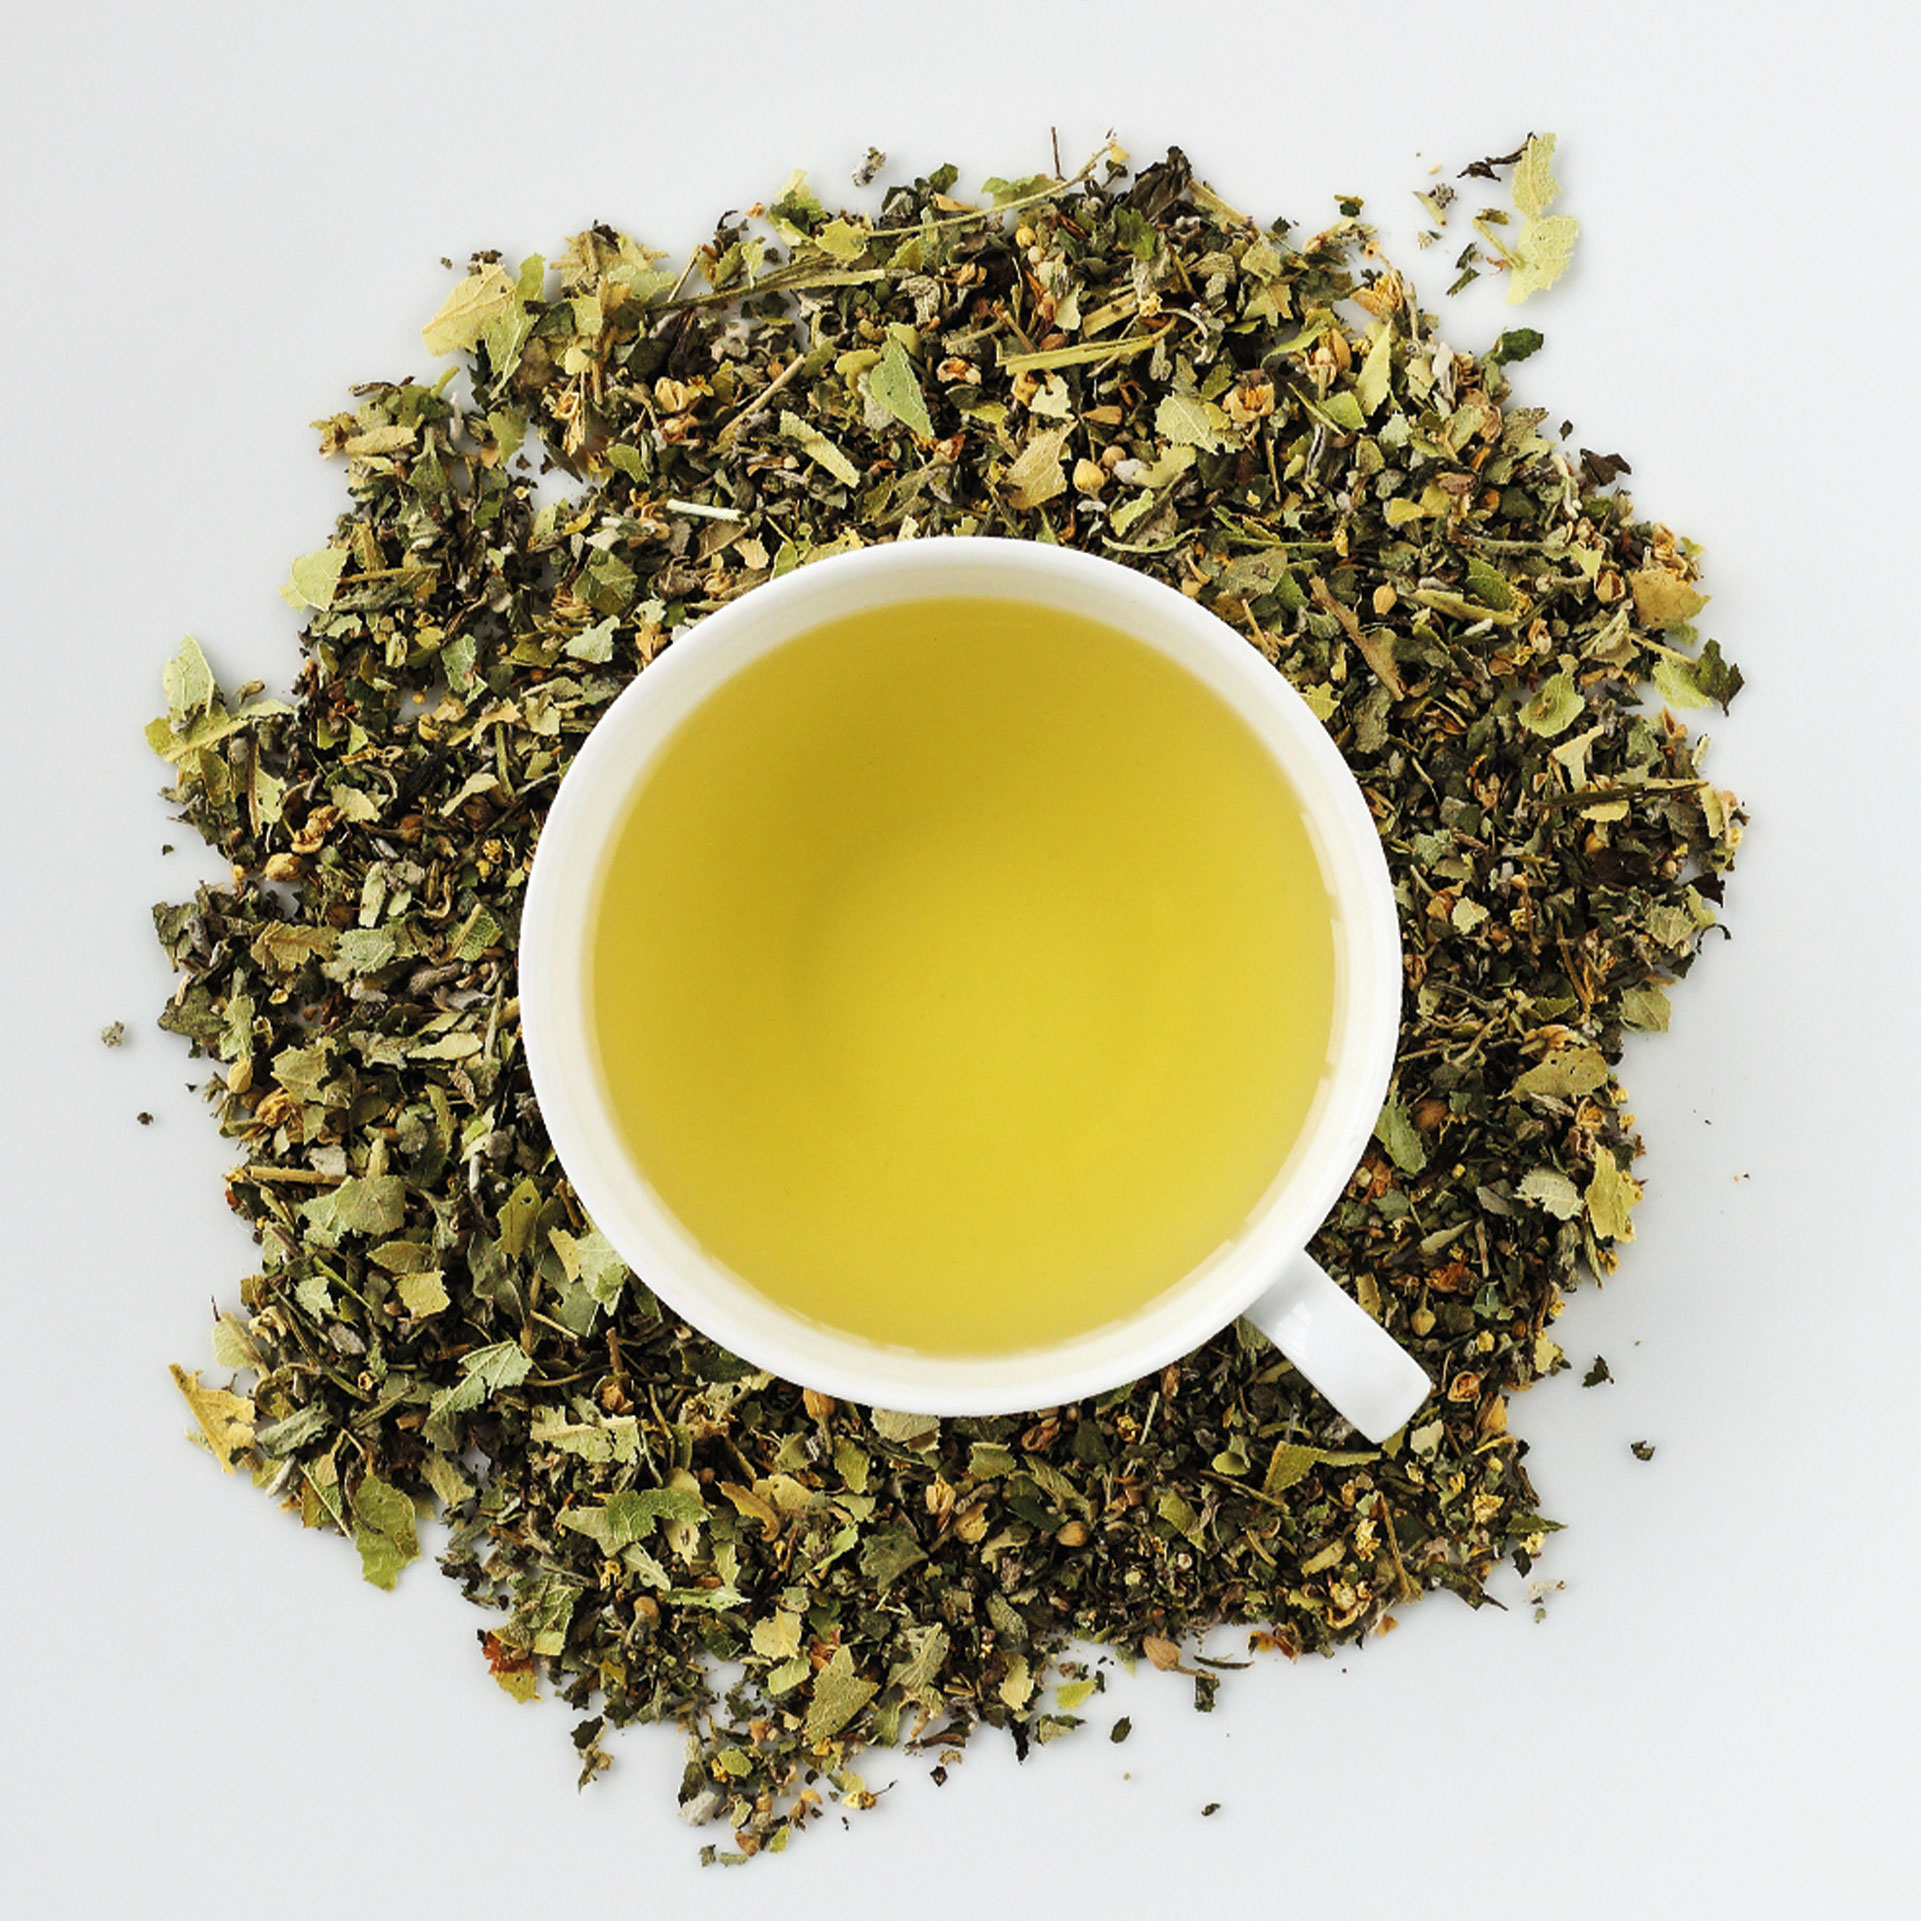 Bio Tee Mountain spring DINZLER Teeselektion